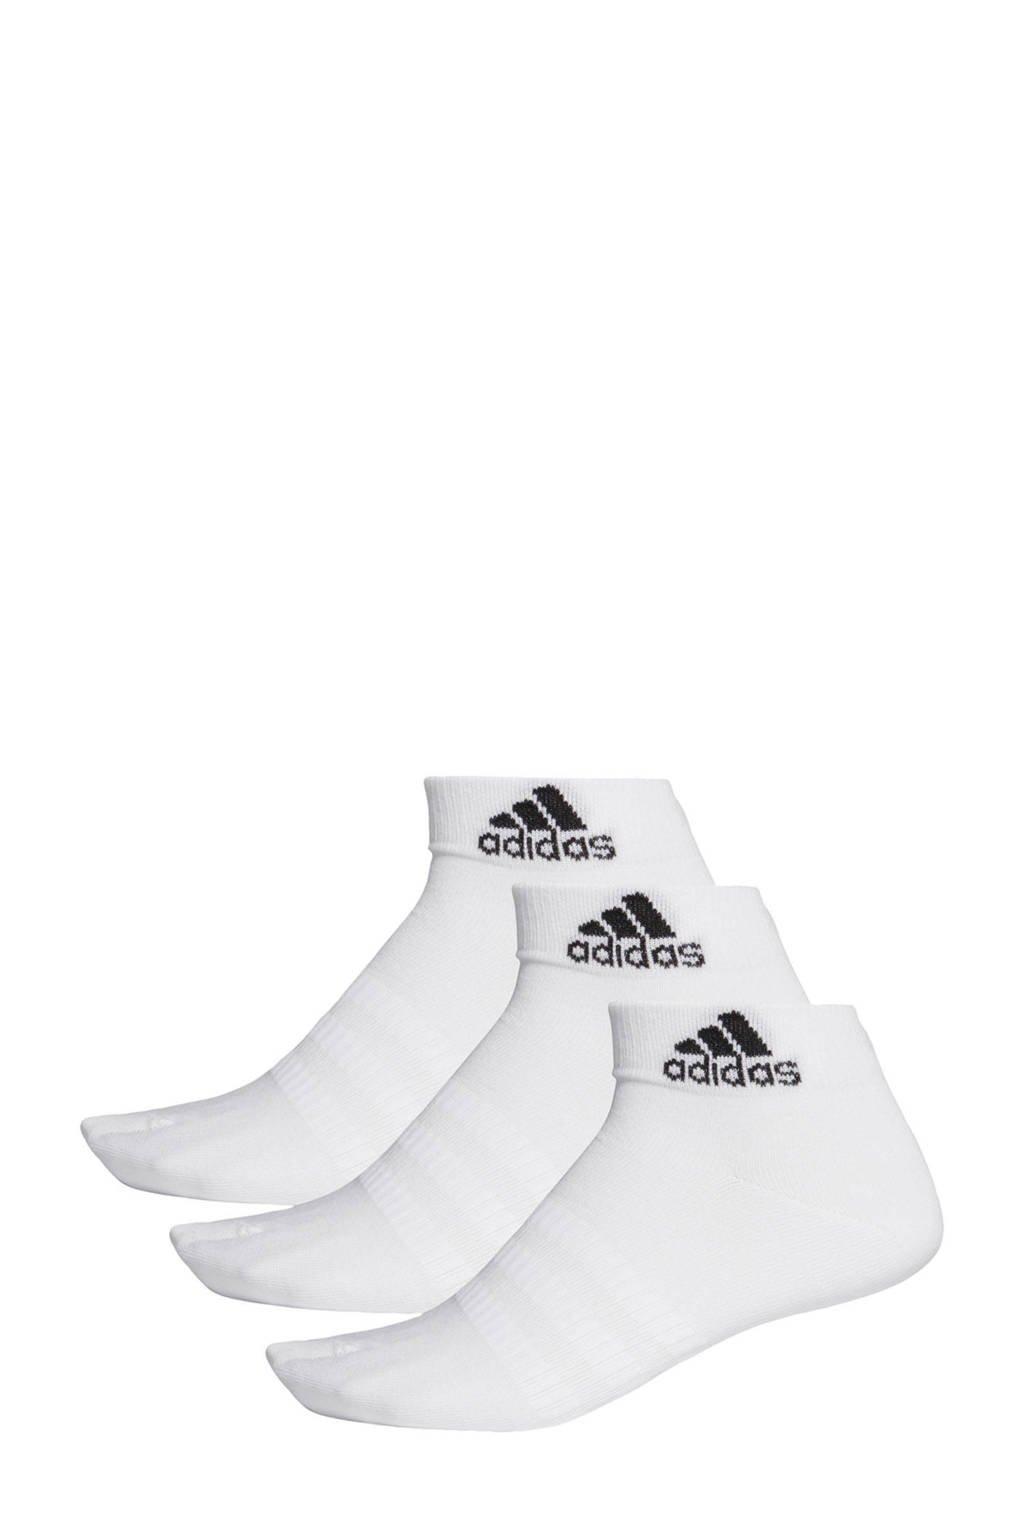 adidas Performance   sportsokken - set van 3 wit, Wit